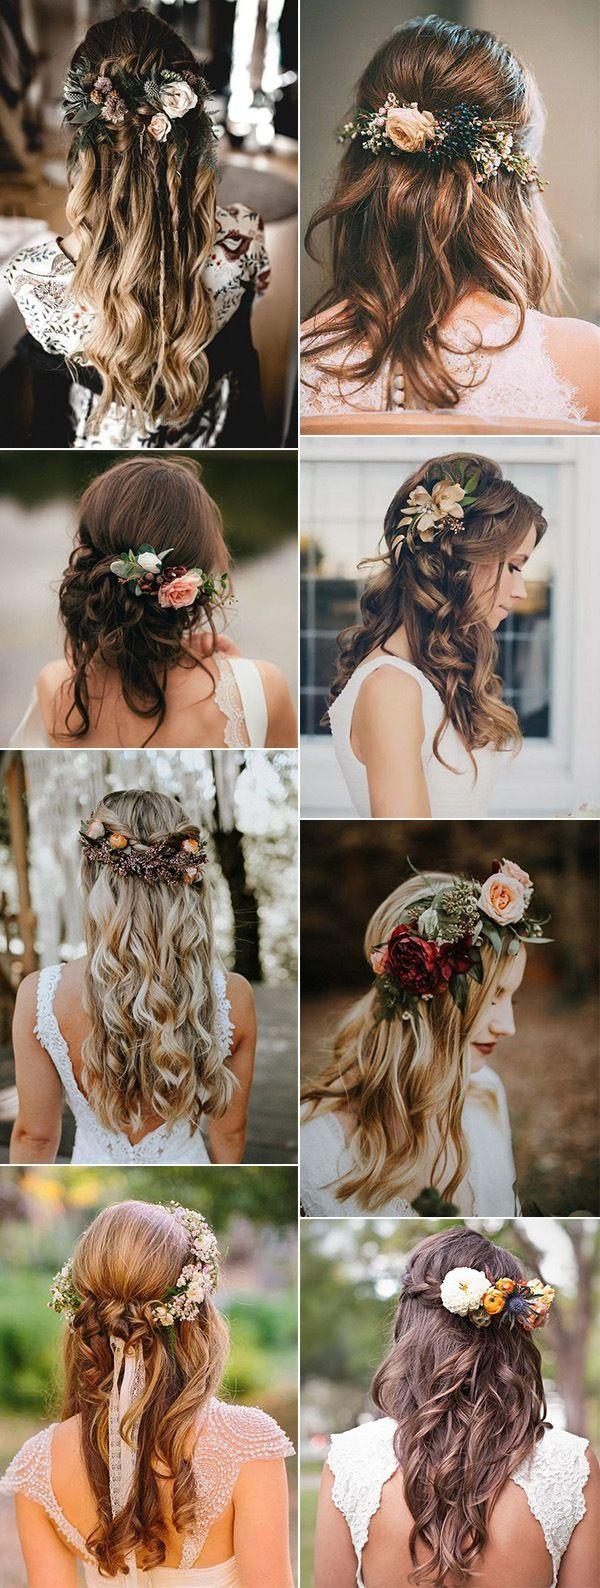 18 Pretty autumn hairstyles that inspire